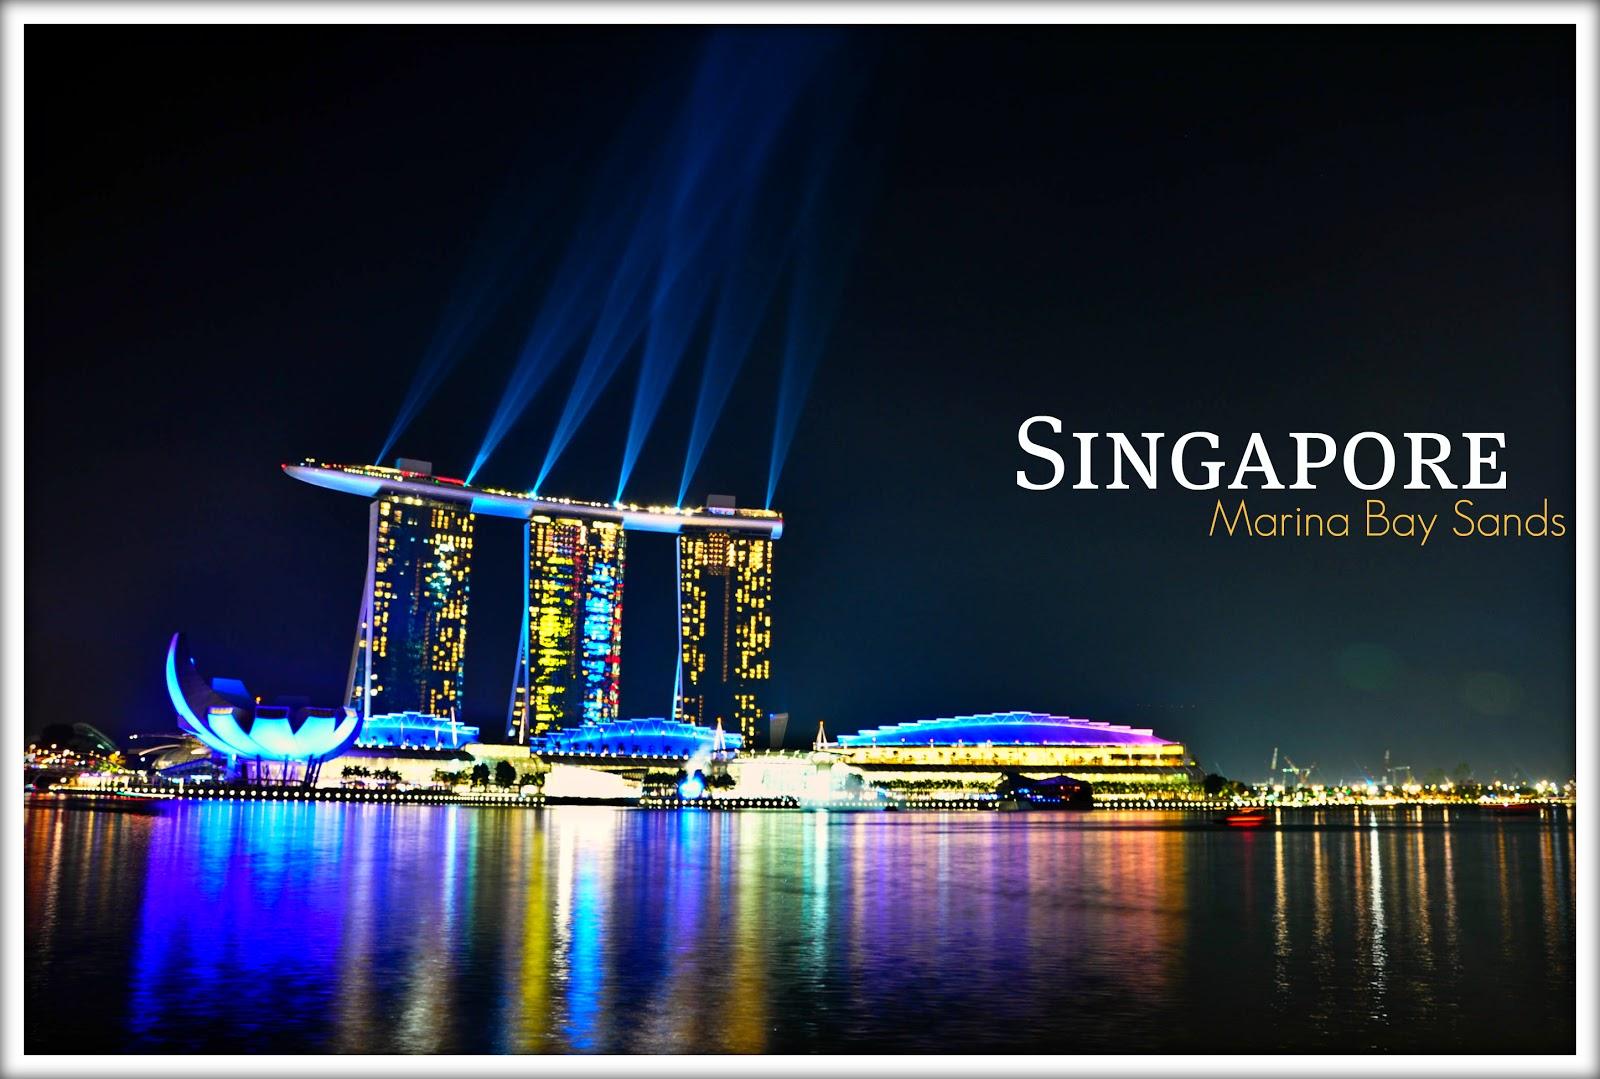 Singapore, Marina Bay Sands | Chik Chak!